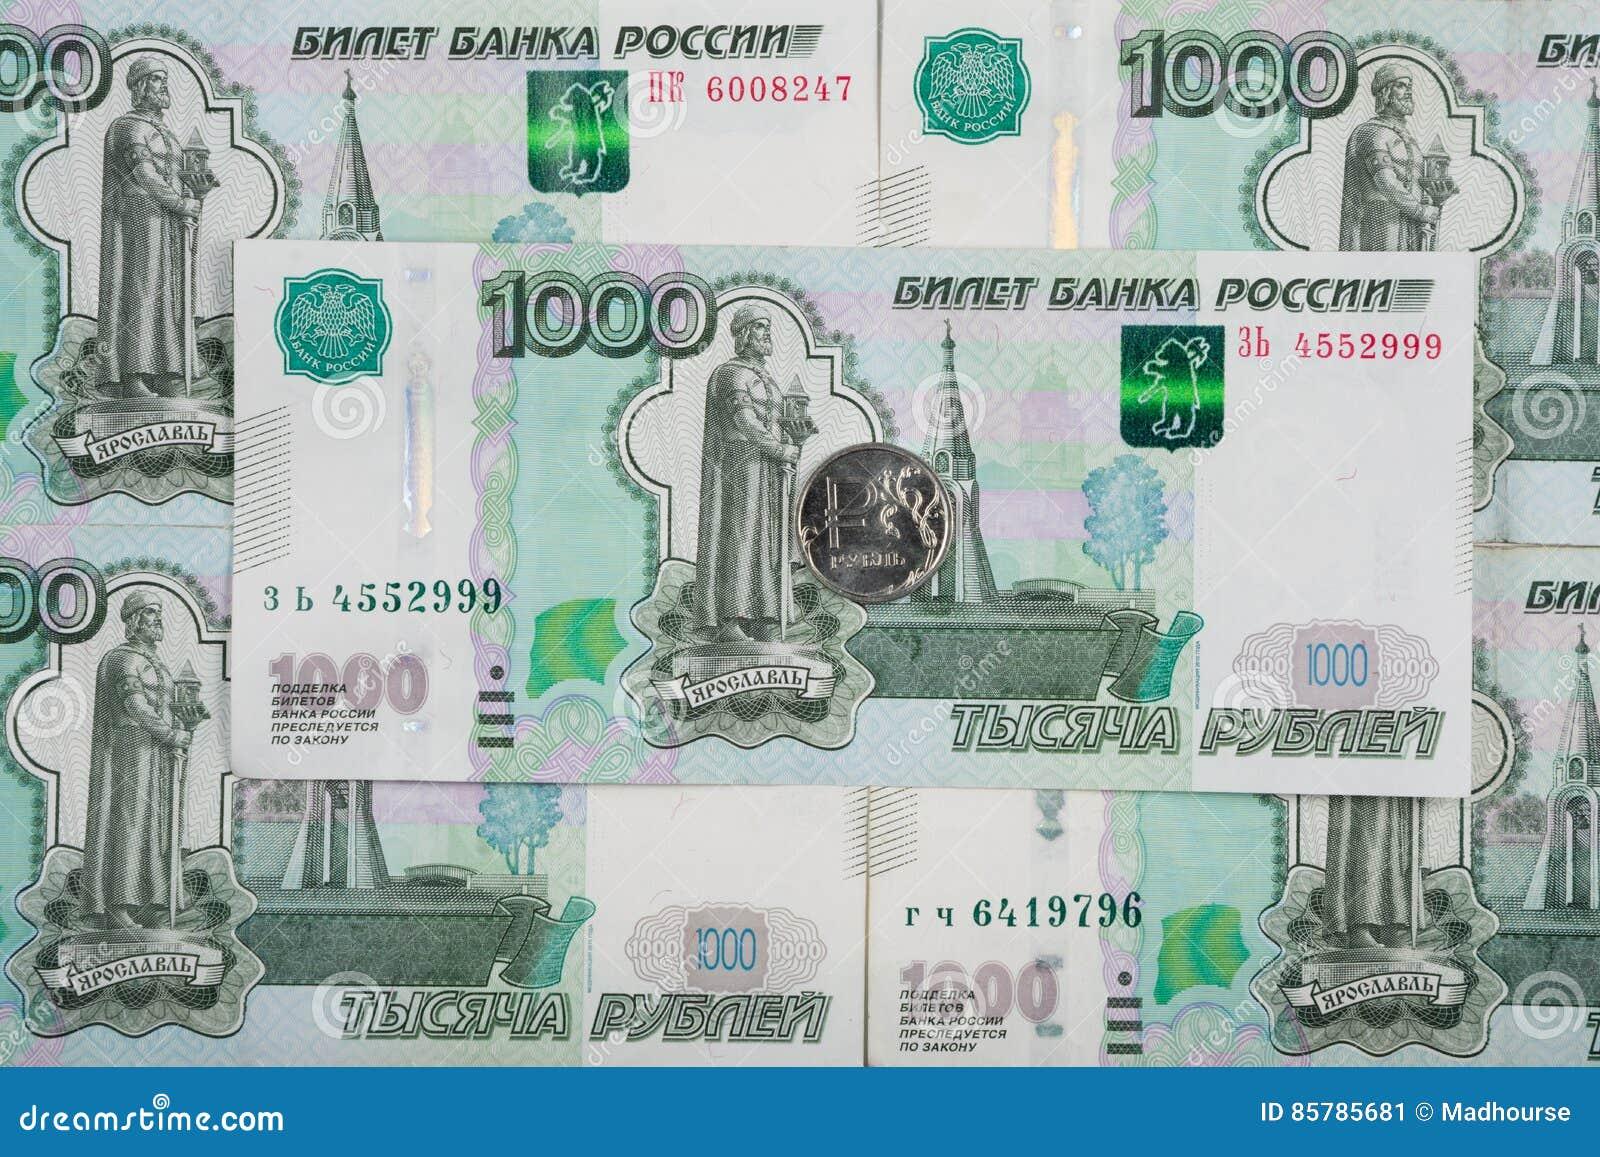 Dream dream Ruble, why dream Ruble in a dream to see 60